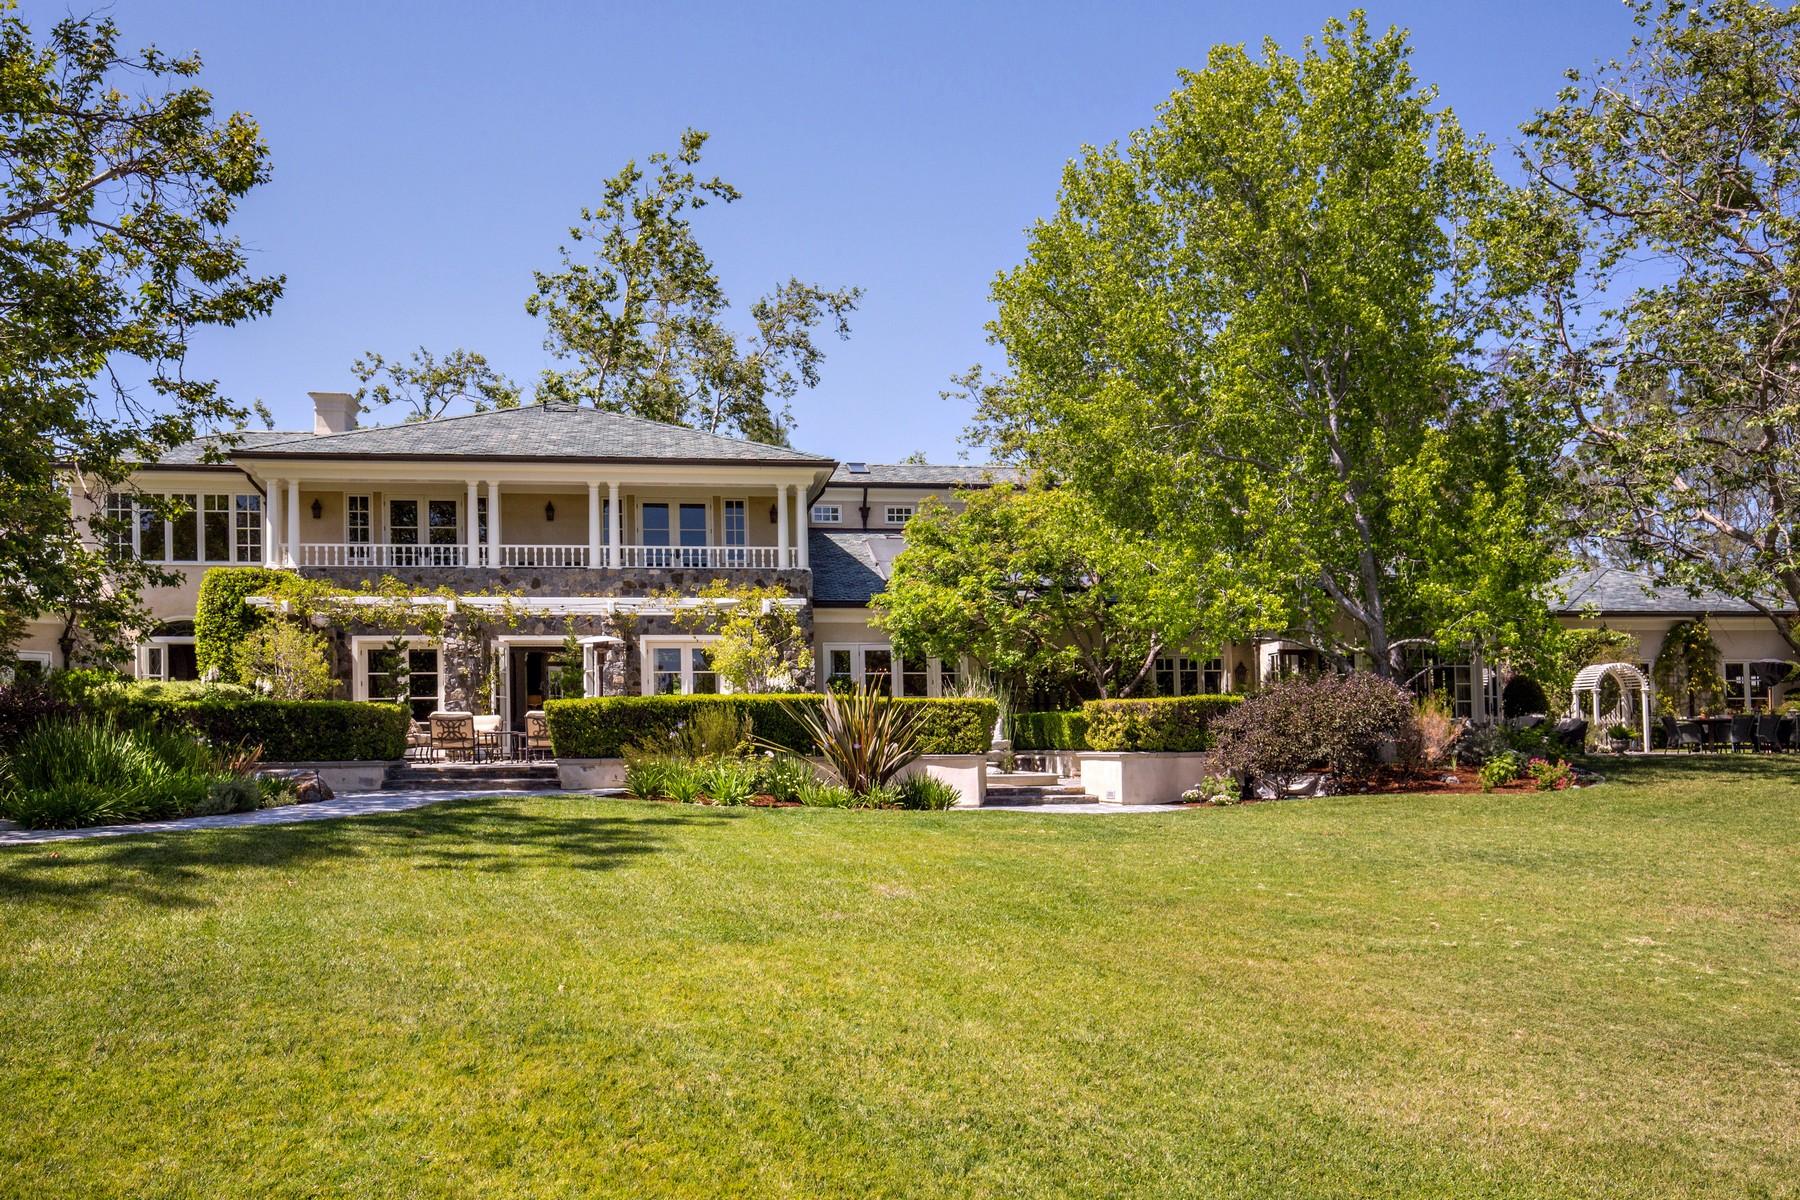 Additional photo for property listing at 17541 Los Morros  Rancho Santa Fe, Калифорния 92067 Соединенные Штаты